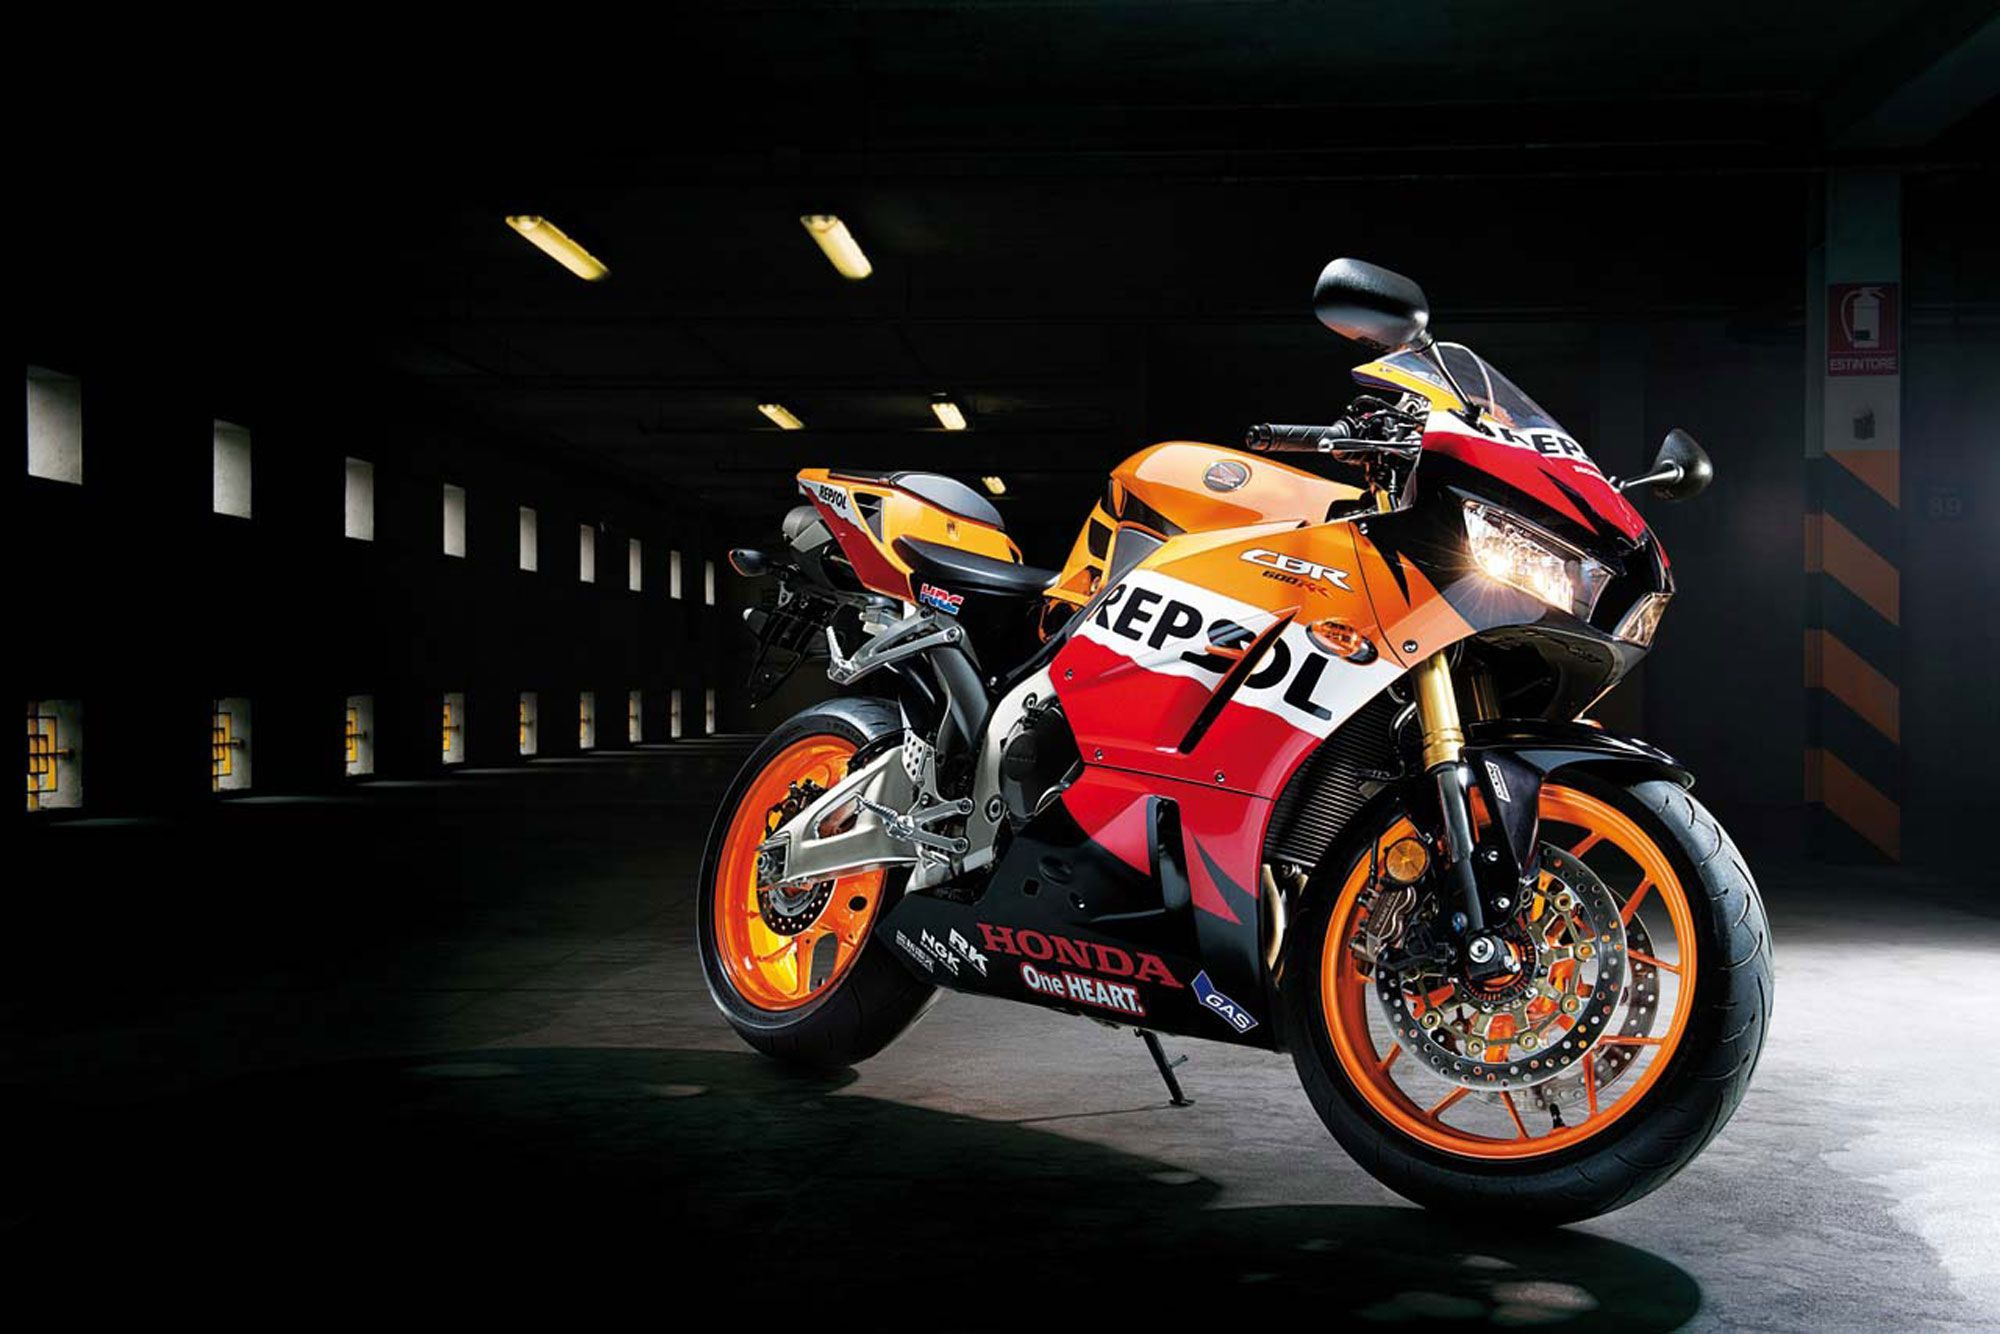 Honda CBR Repsol Wallpapers   Top Honda CBR Repsol 2000x1334